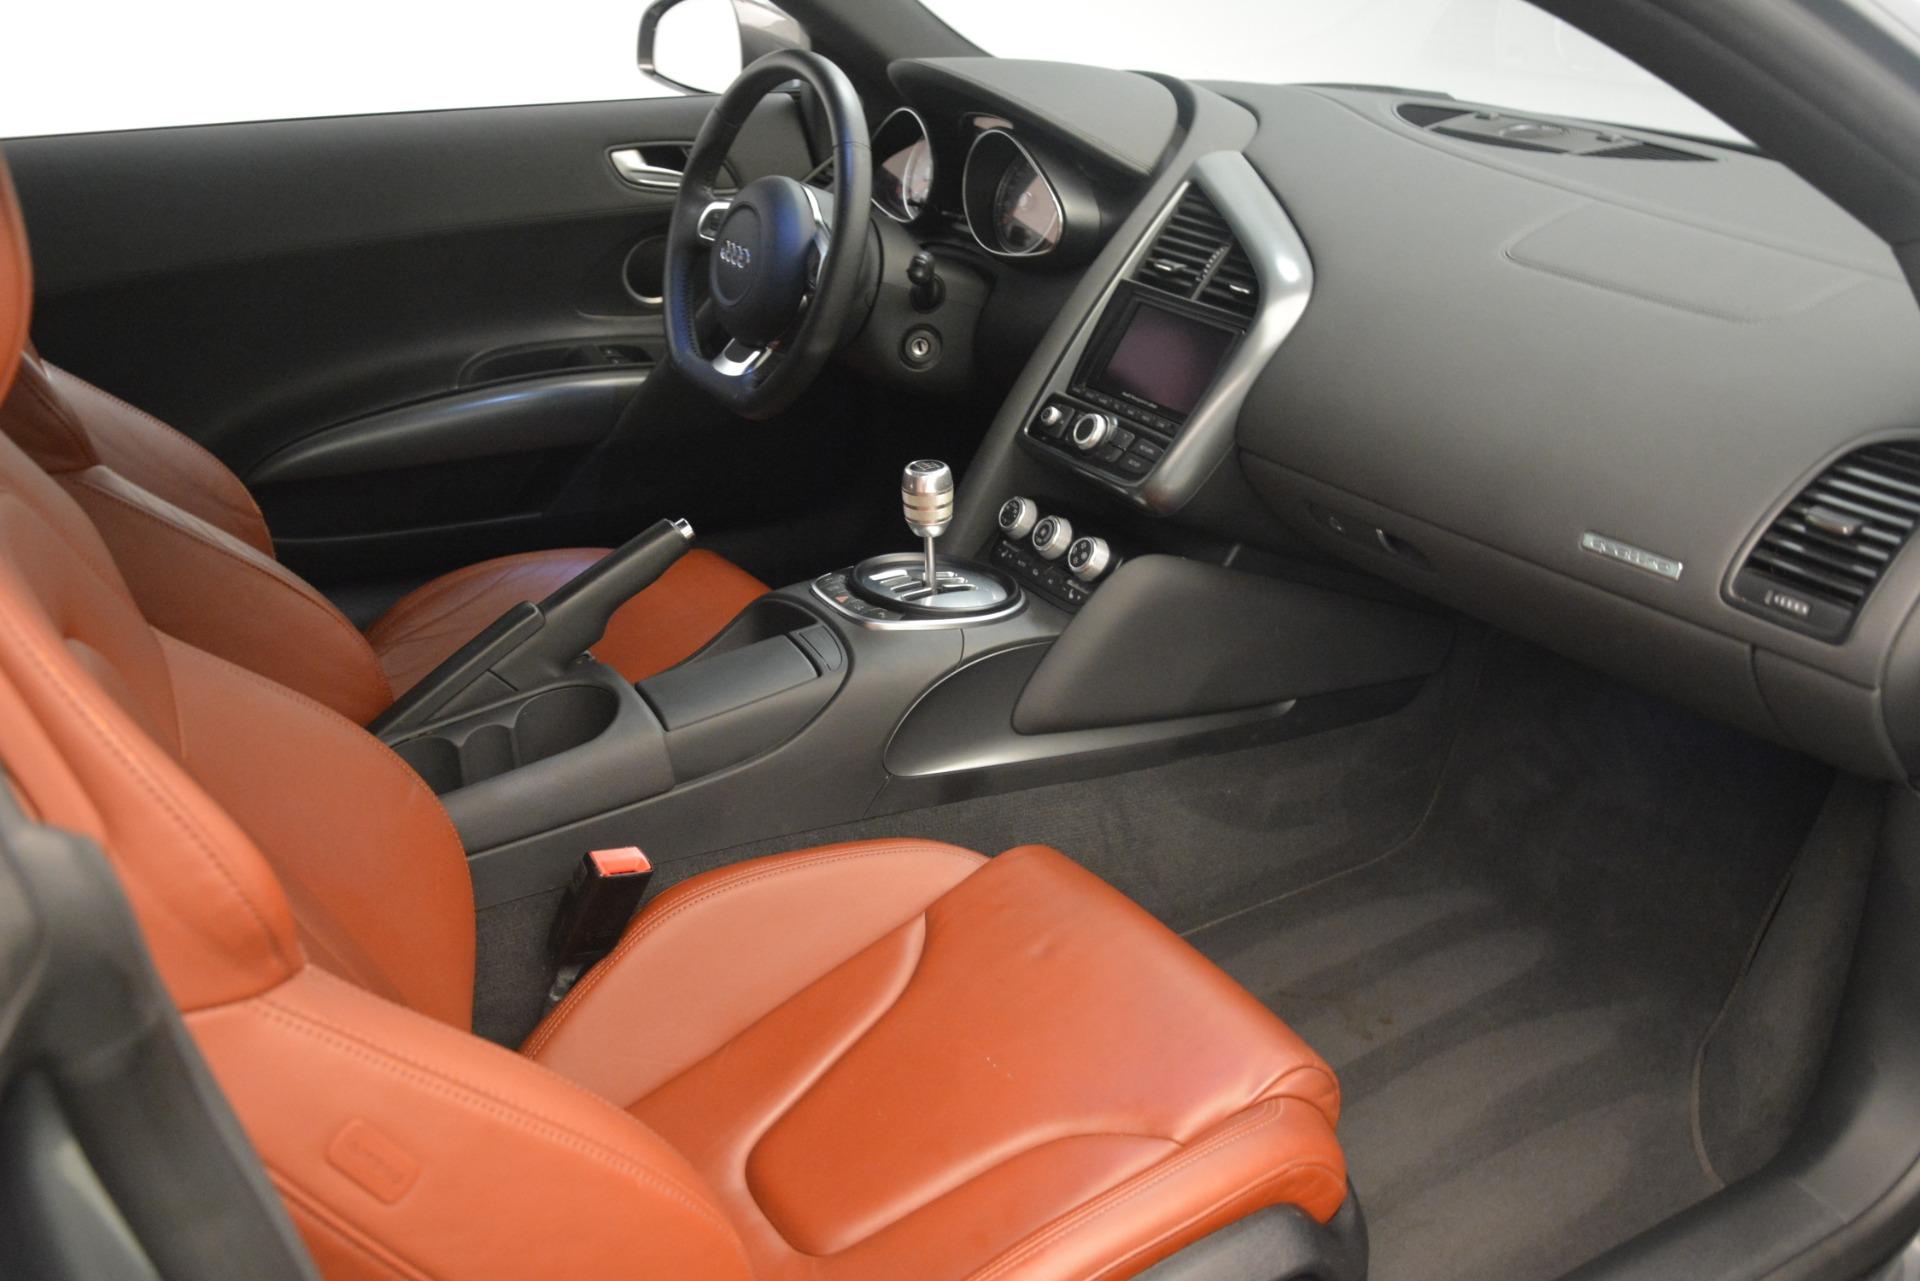 Used 2009 Audi R8 quattro For Sale In Greenwich, CT 3228_p16